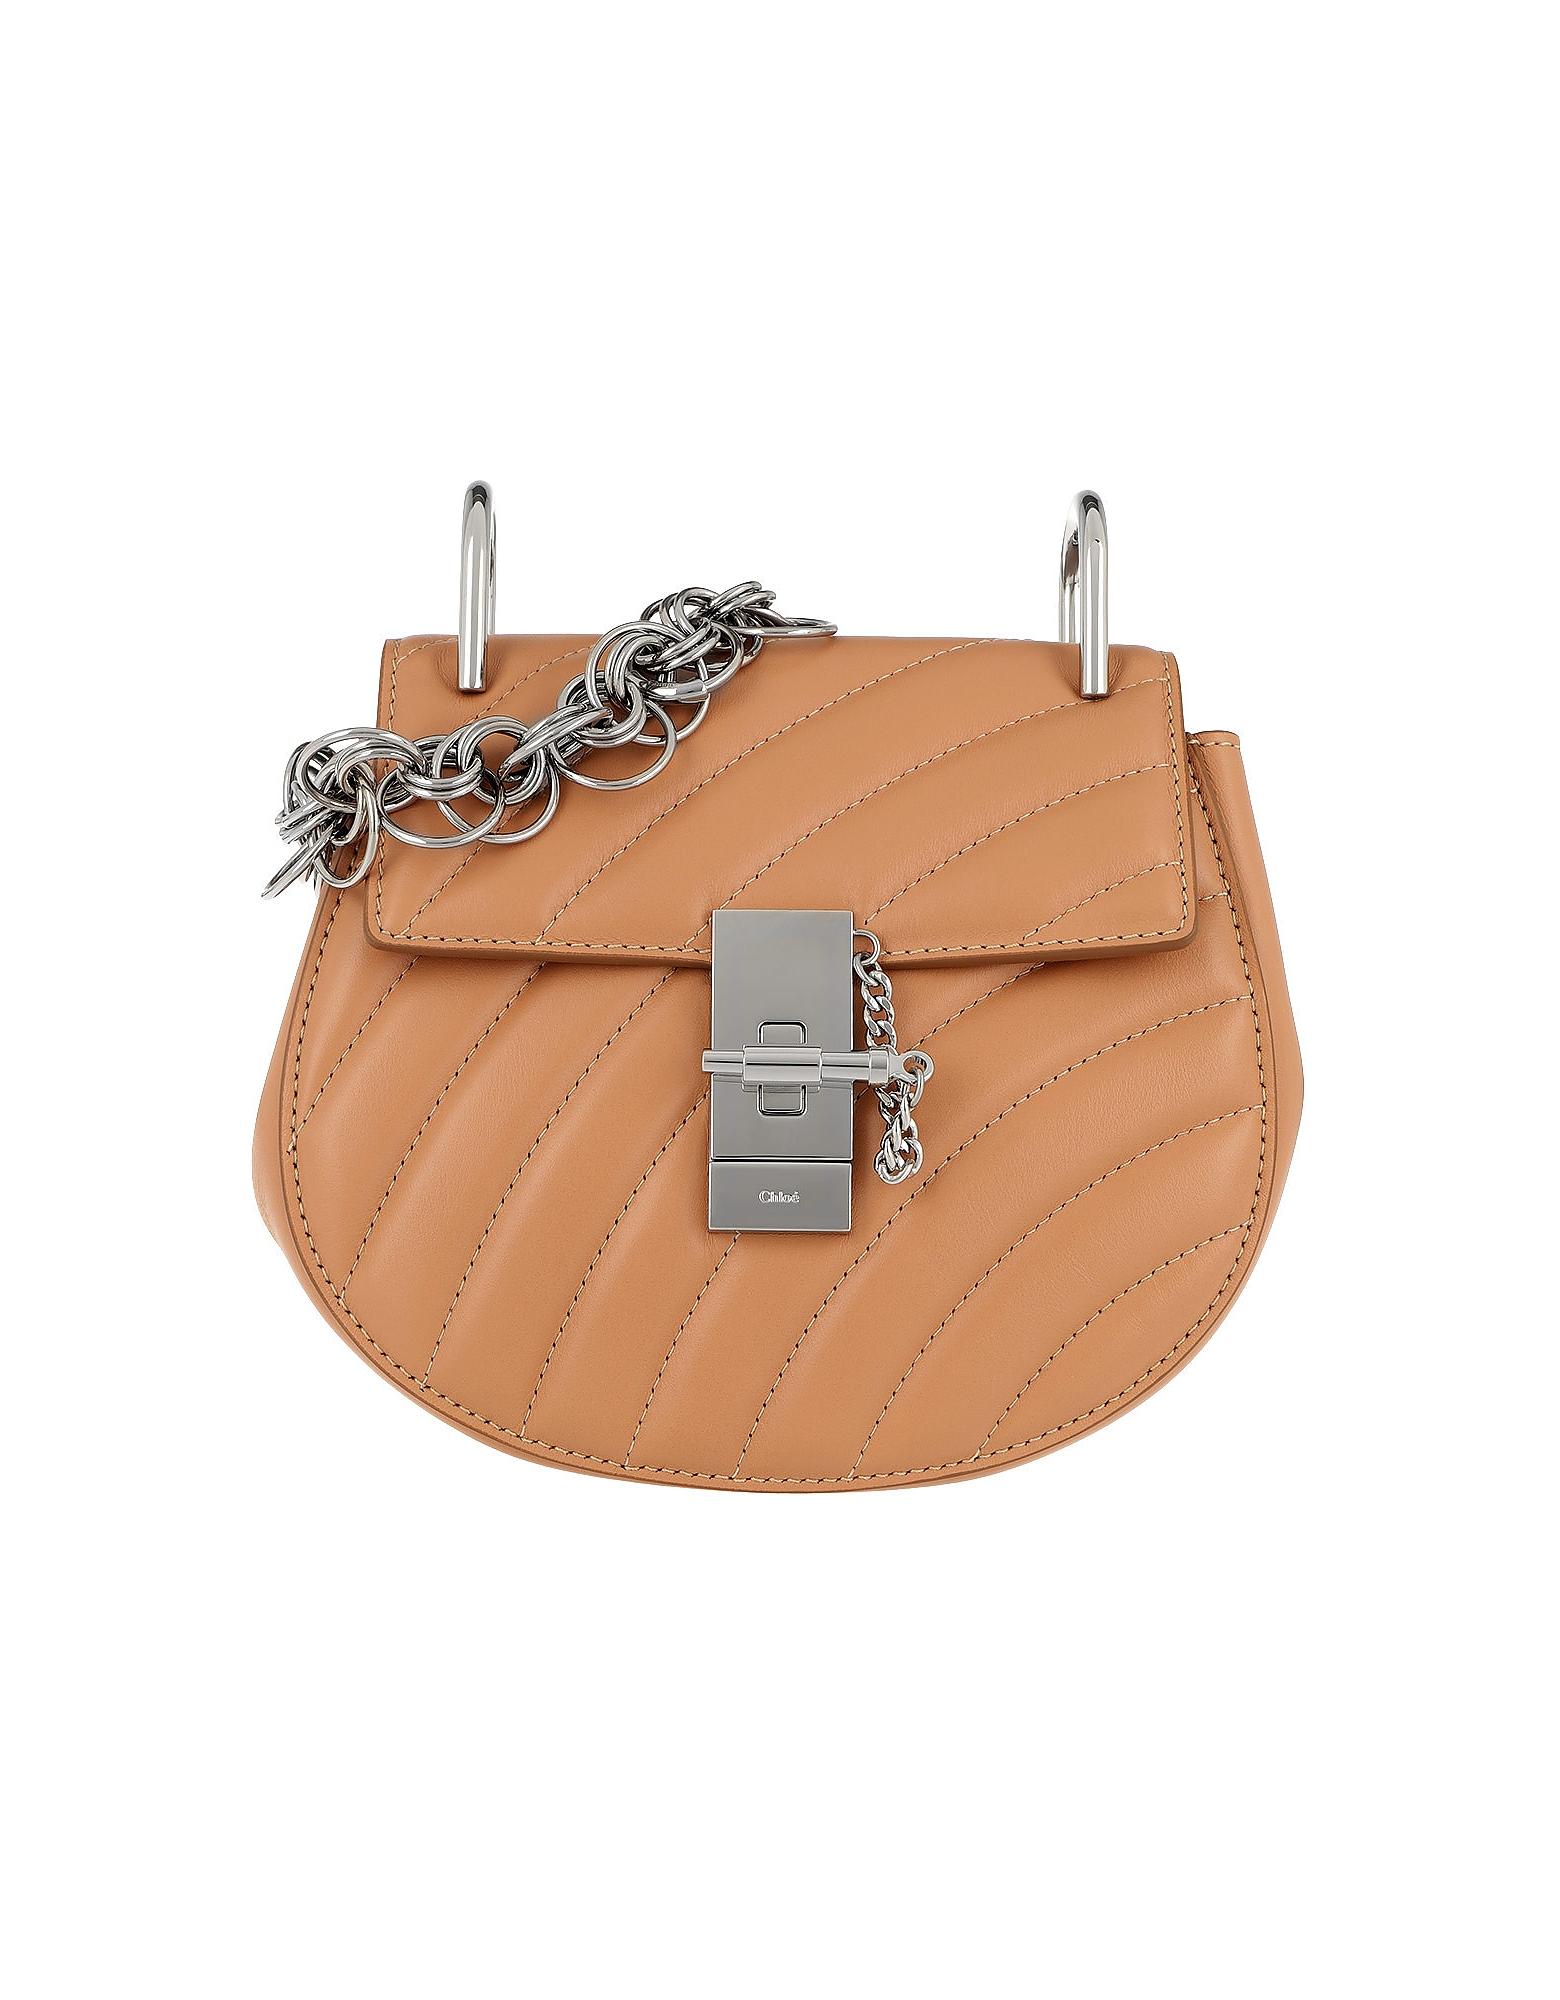 Chloe Handbags, Drew Bijou Mini Quilted Leather Blush Pink